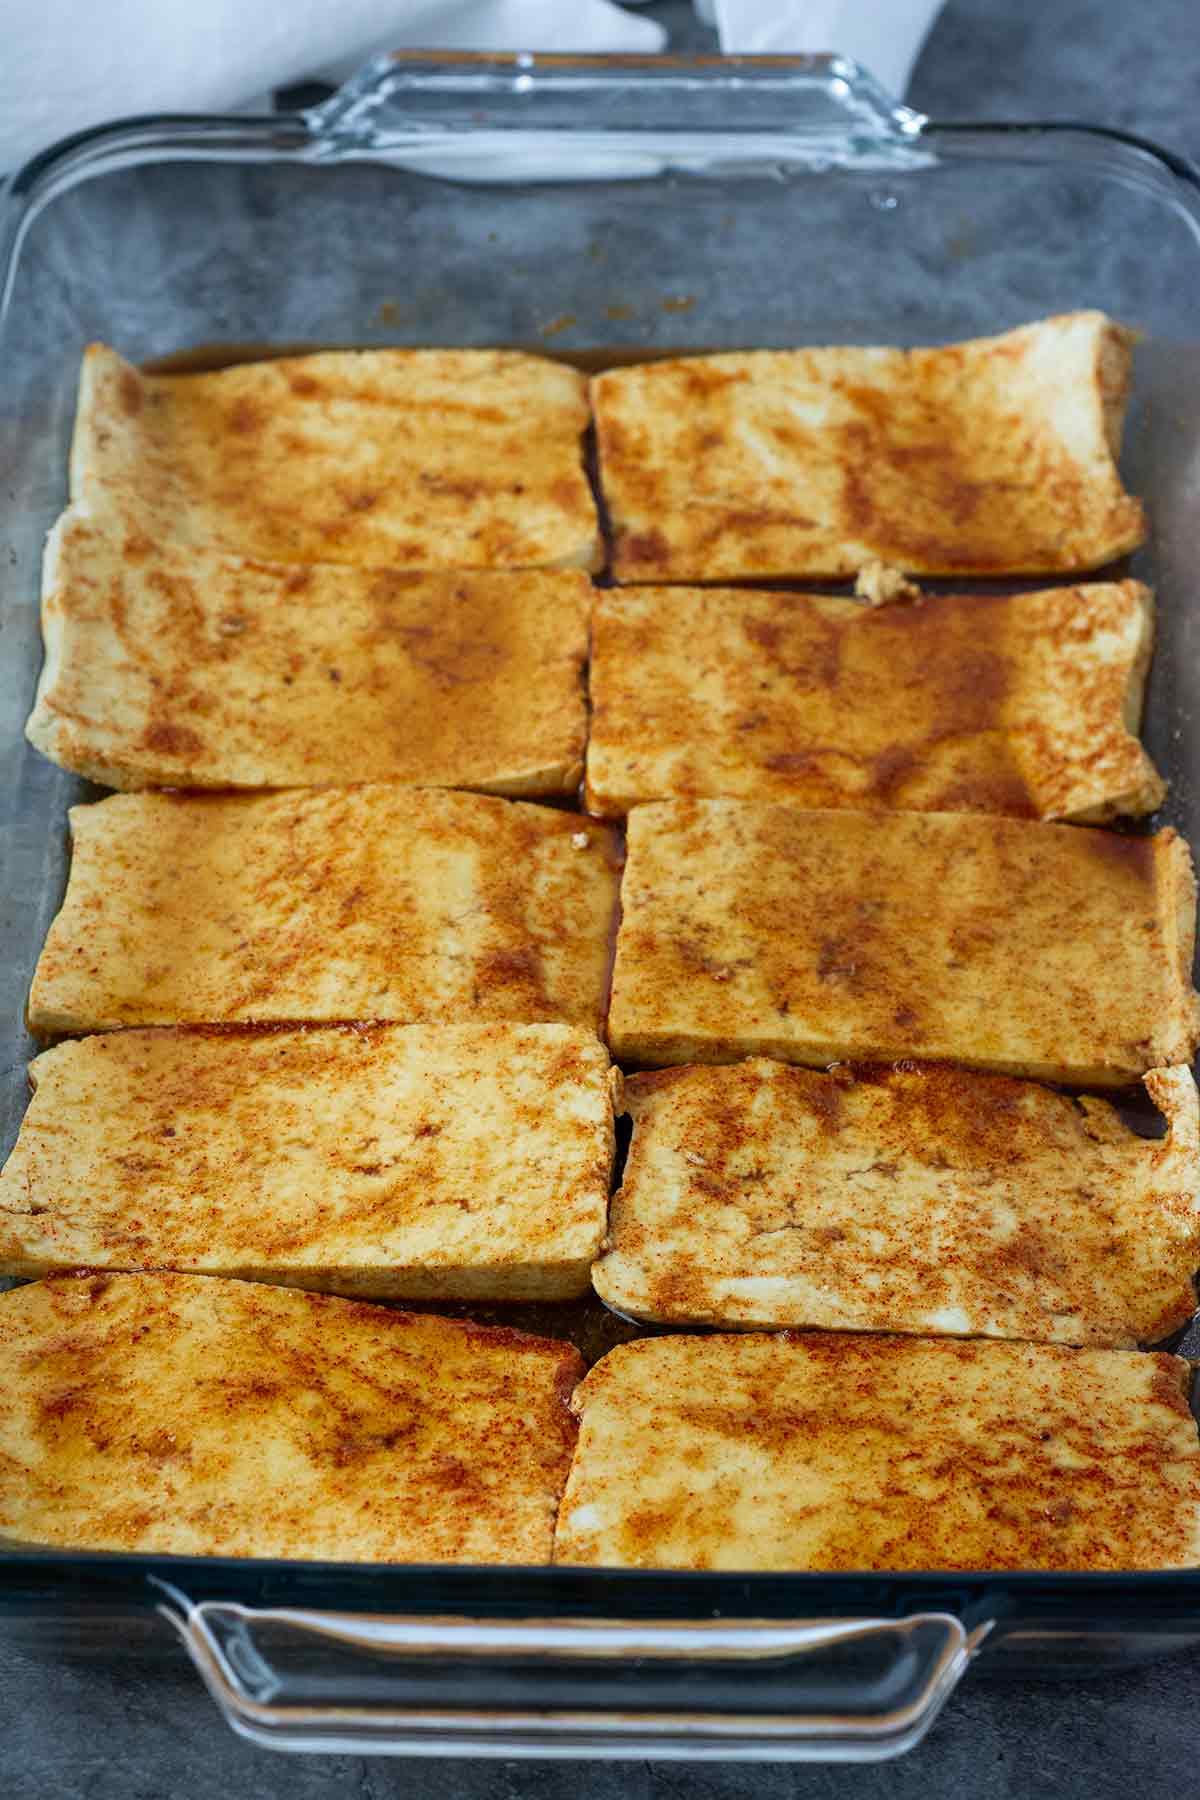 marinated tofu bacon in a glass baking dish